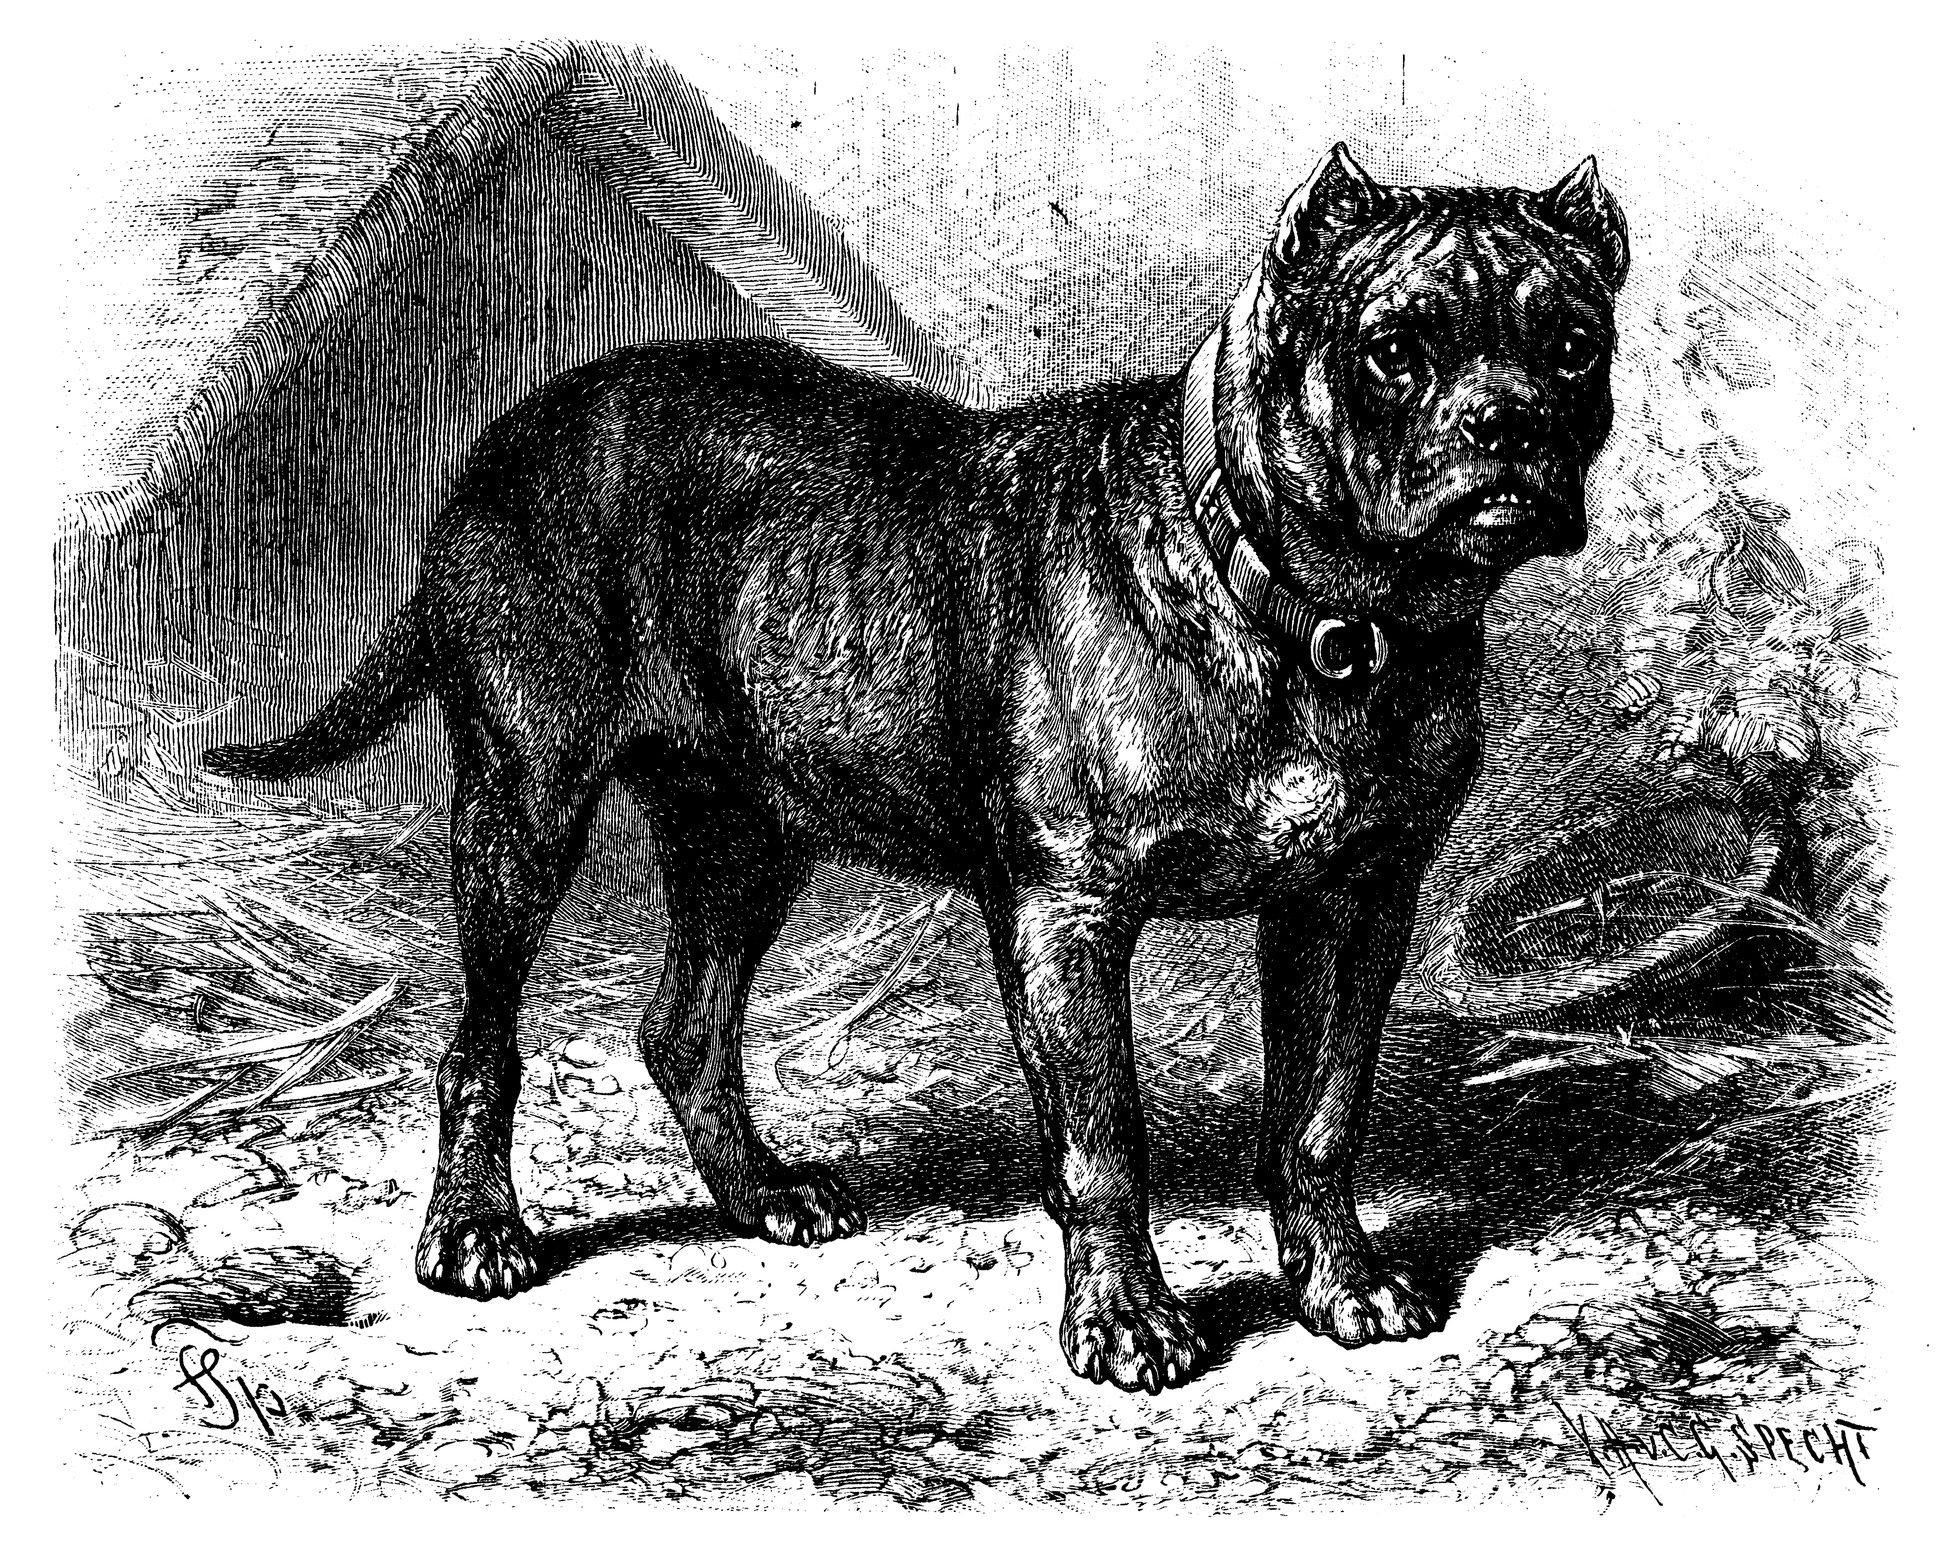 Antique illustration of Bullenbeisser (German Bulldog)